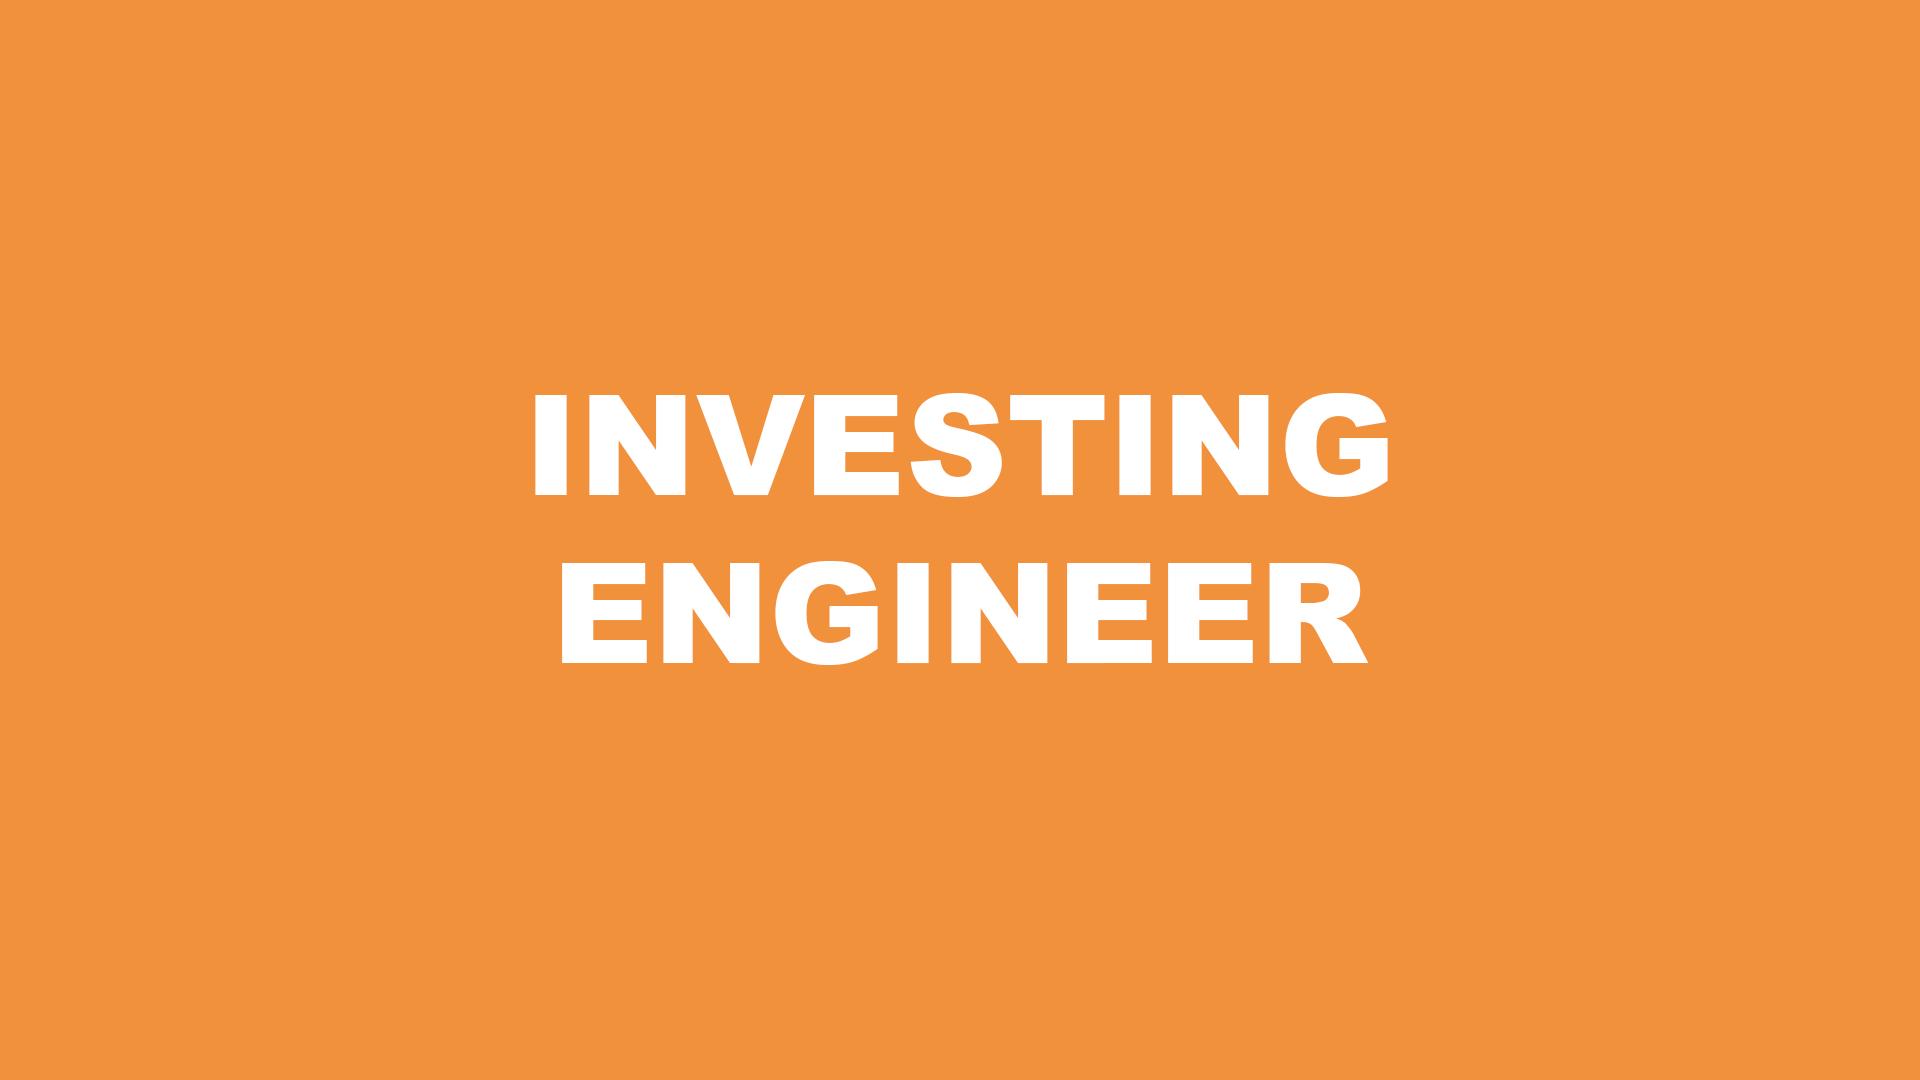 investing engineer ph